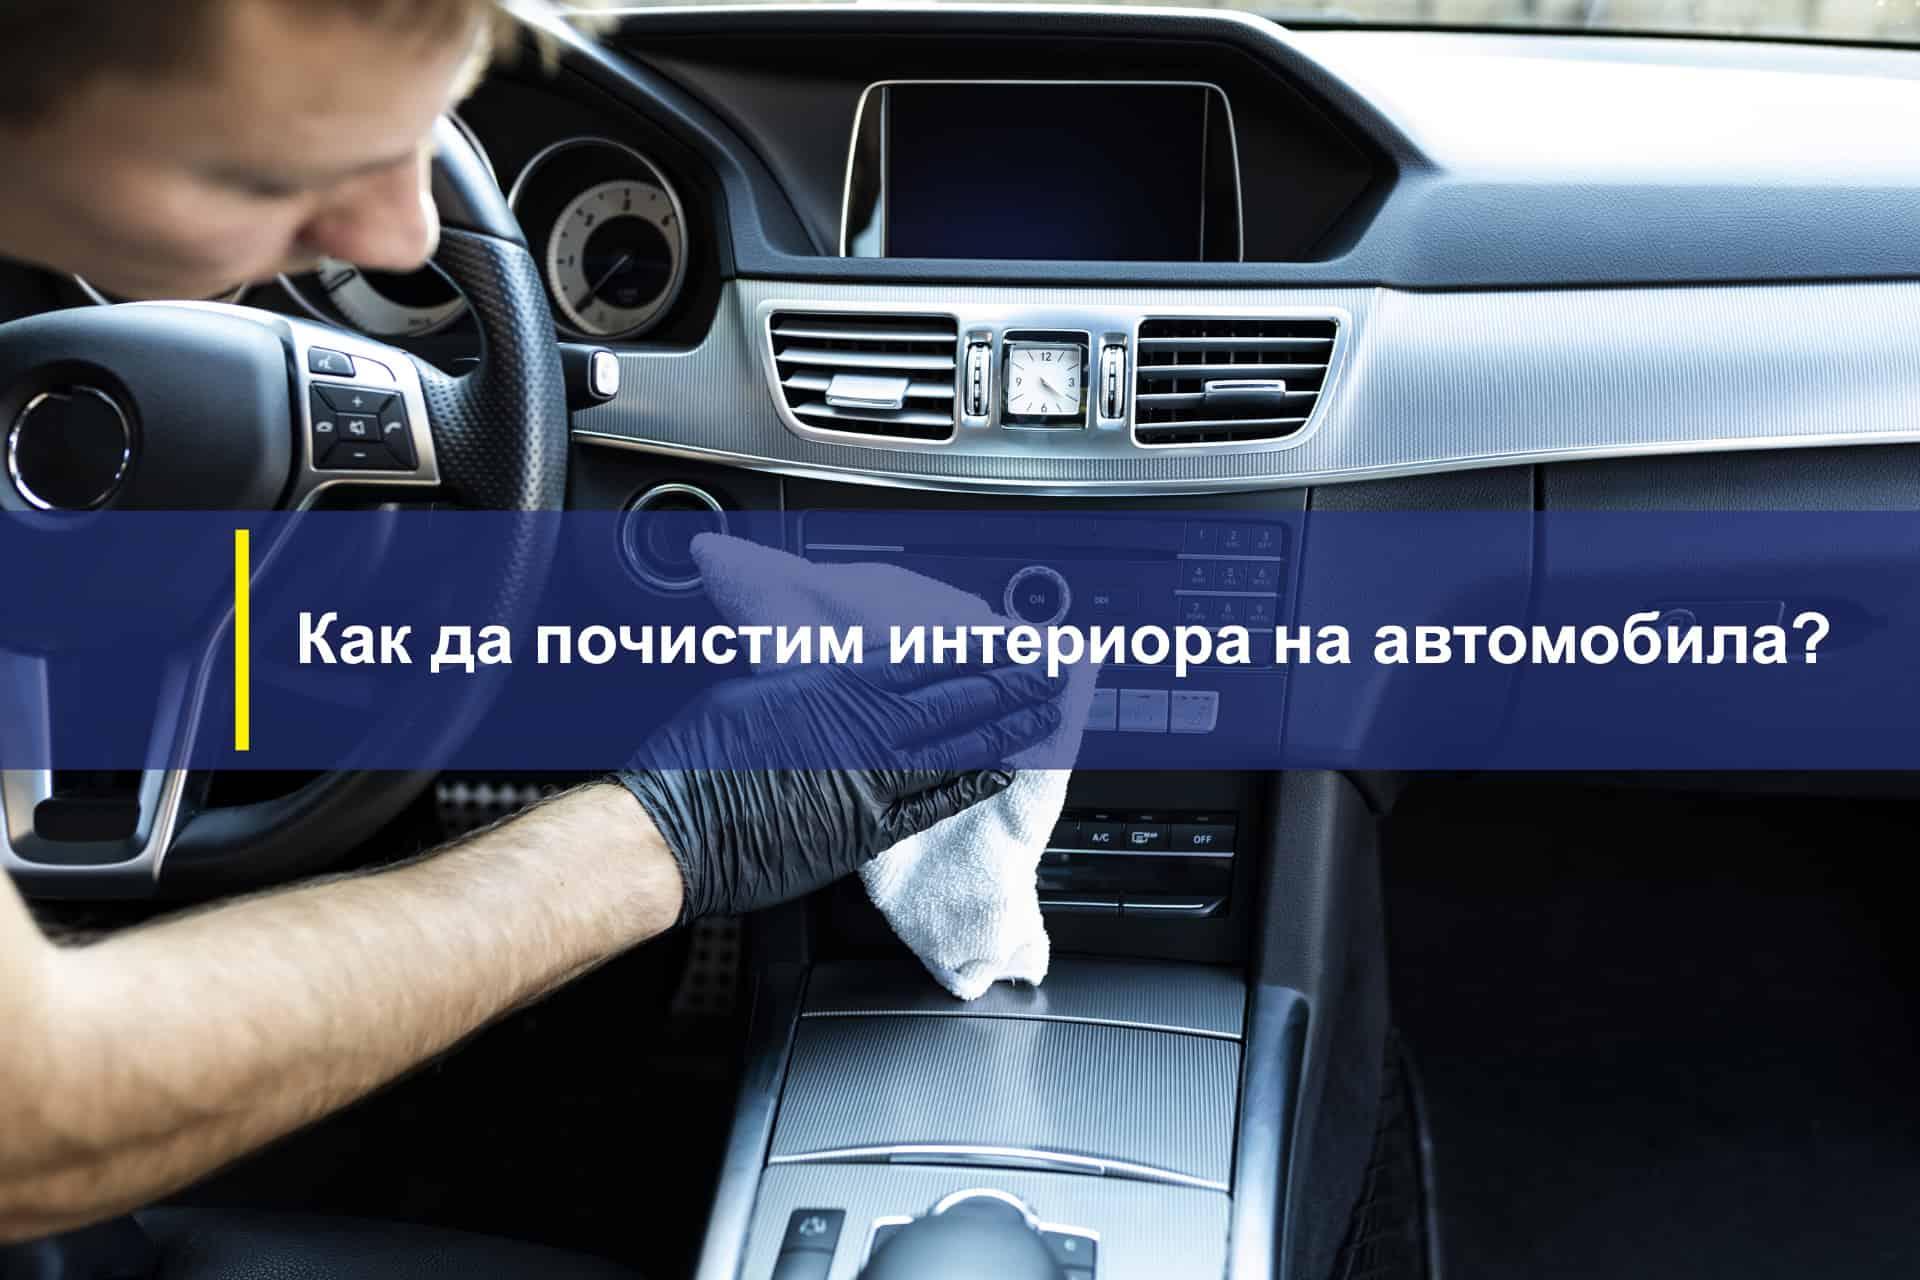 Как да почистим интериора на автомобила?